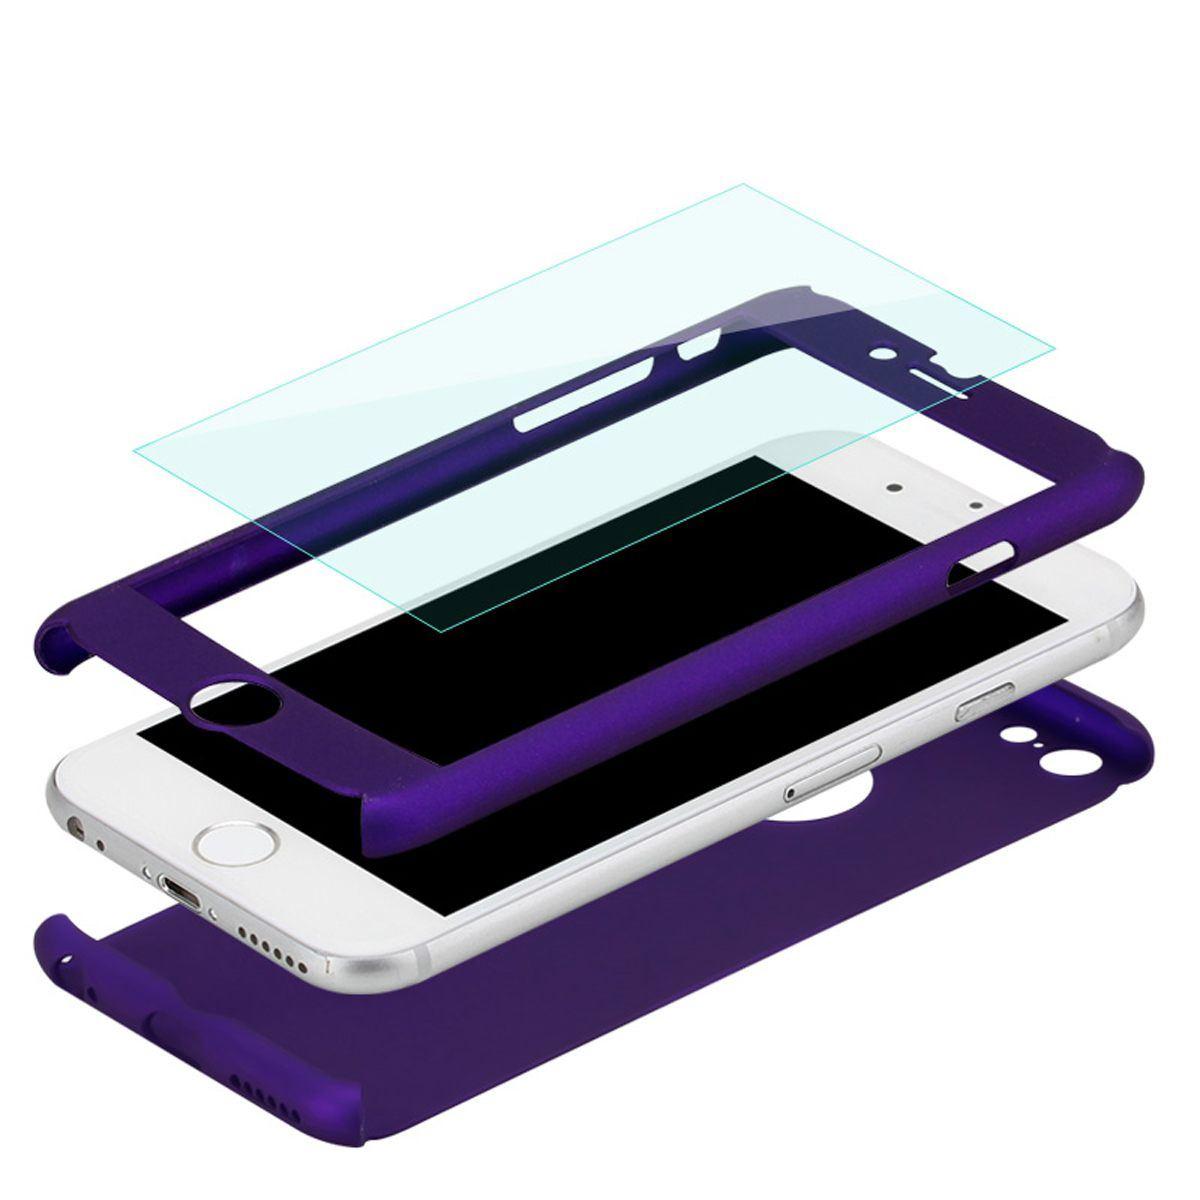 For-Apple-iPhone-XS-Max-XR-Hybrid-360-Slim-Ultra-Thin-Heavy-Duty-Shockproof-Case Indexbild 81